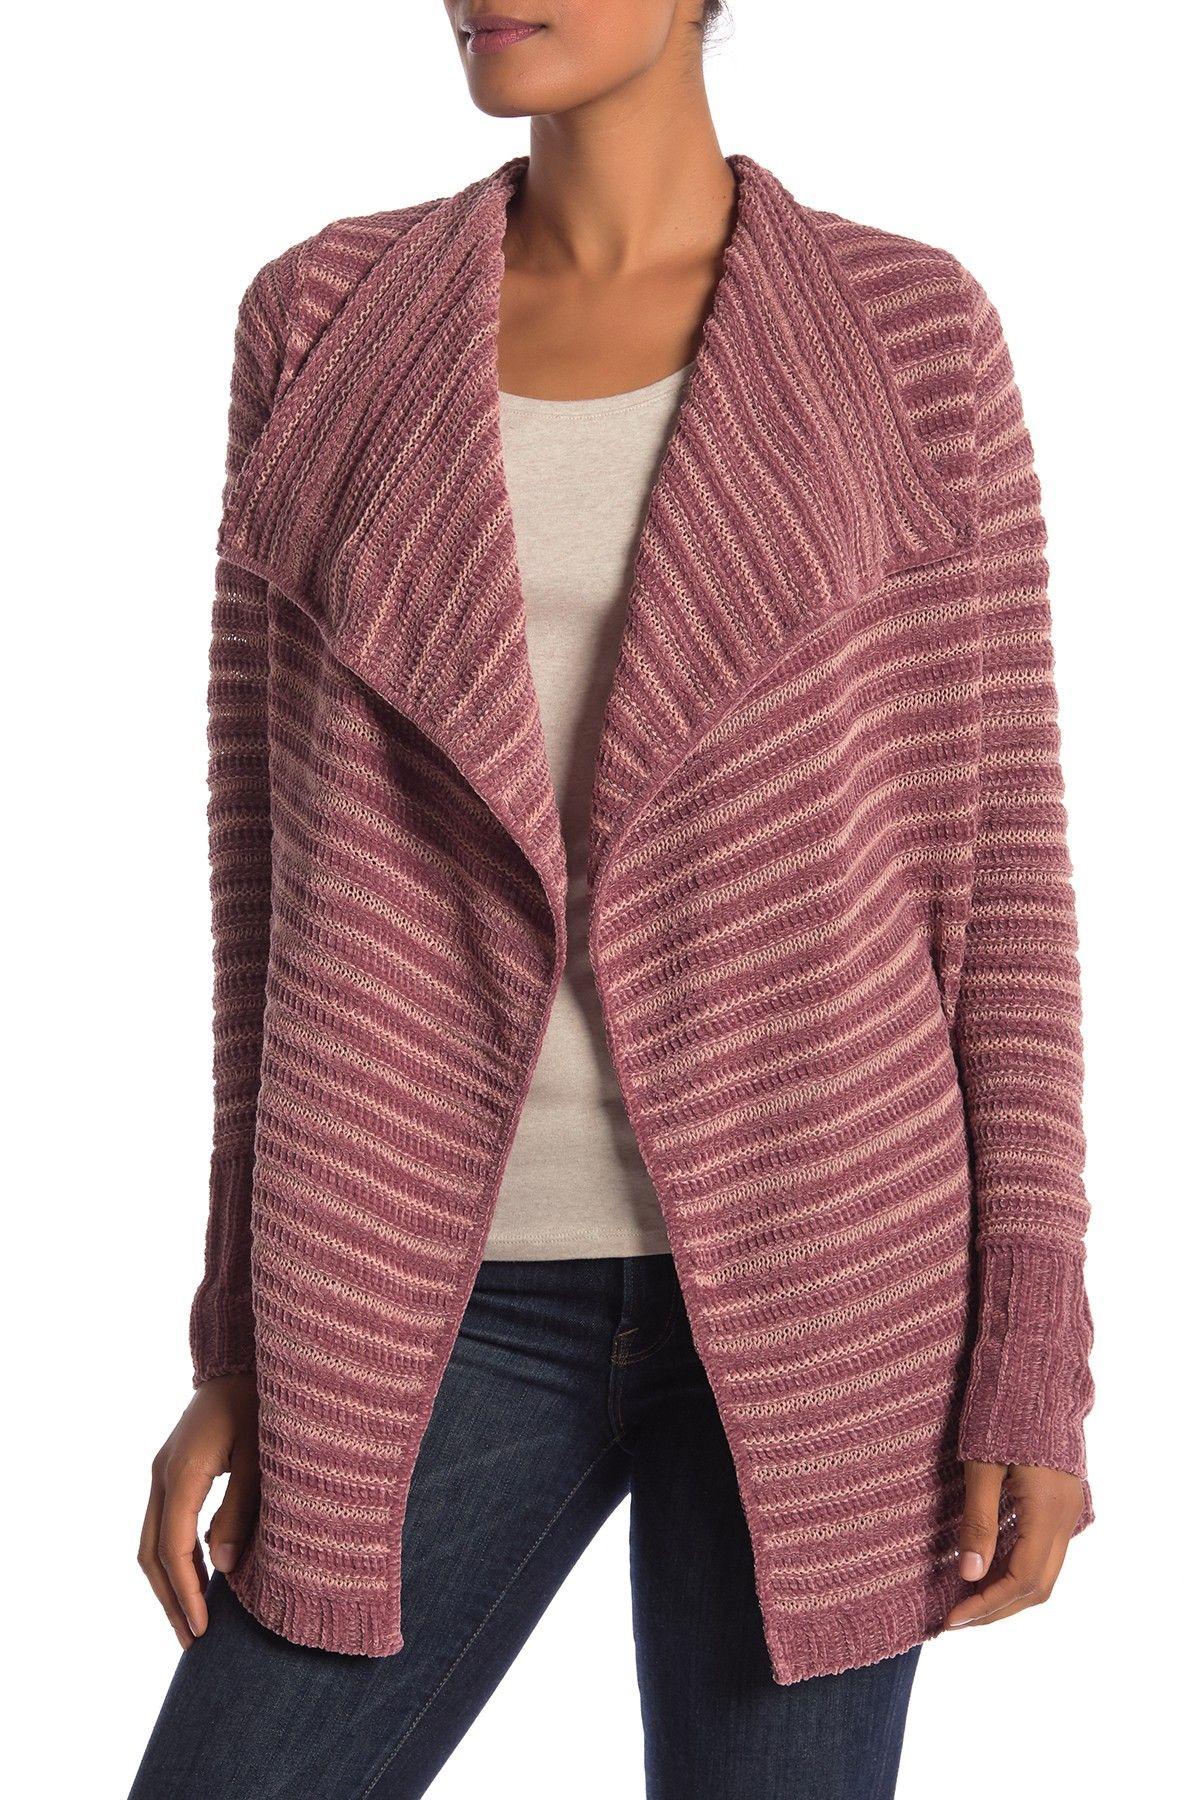 Chenille Soft Knit Cardigan (Regular & Petite) #nordstromrack